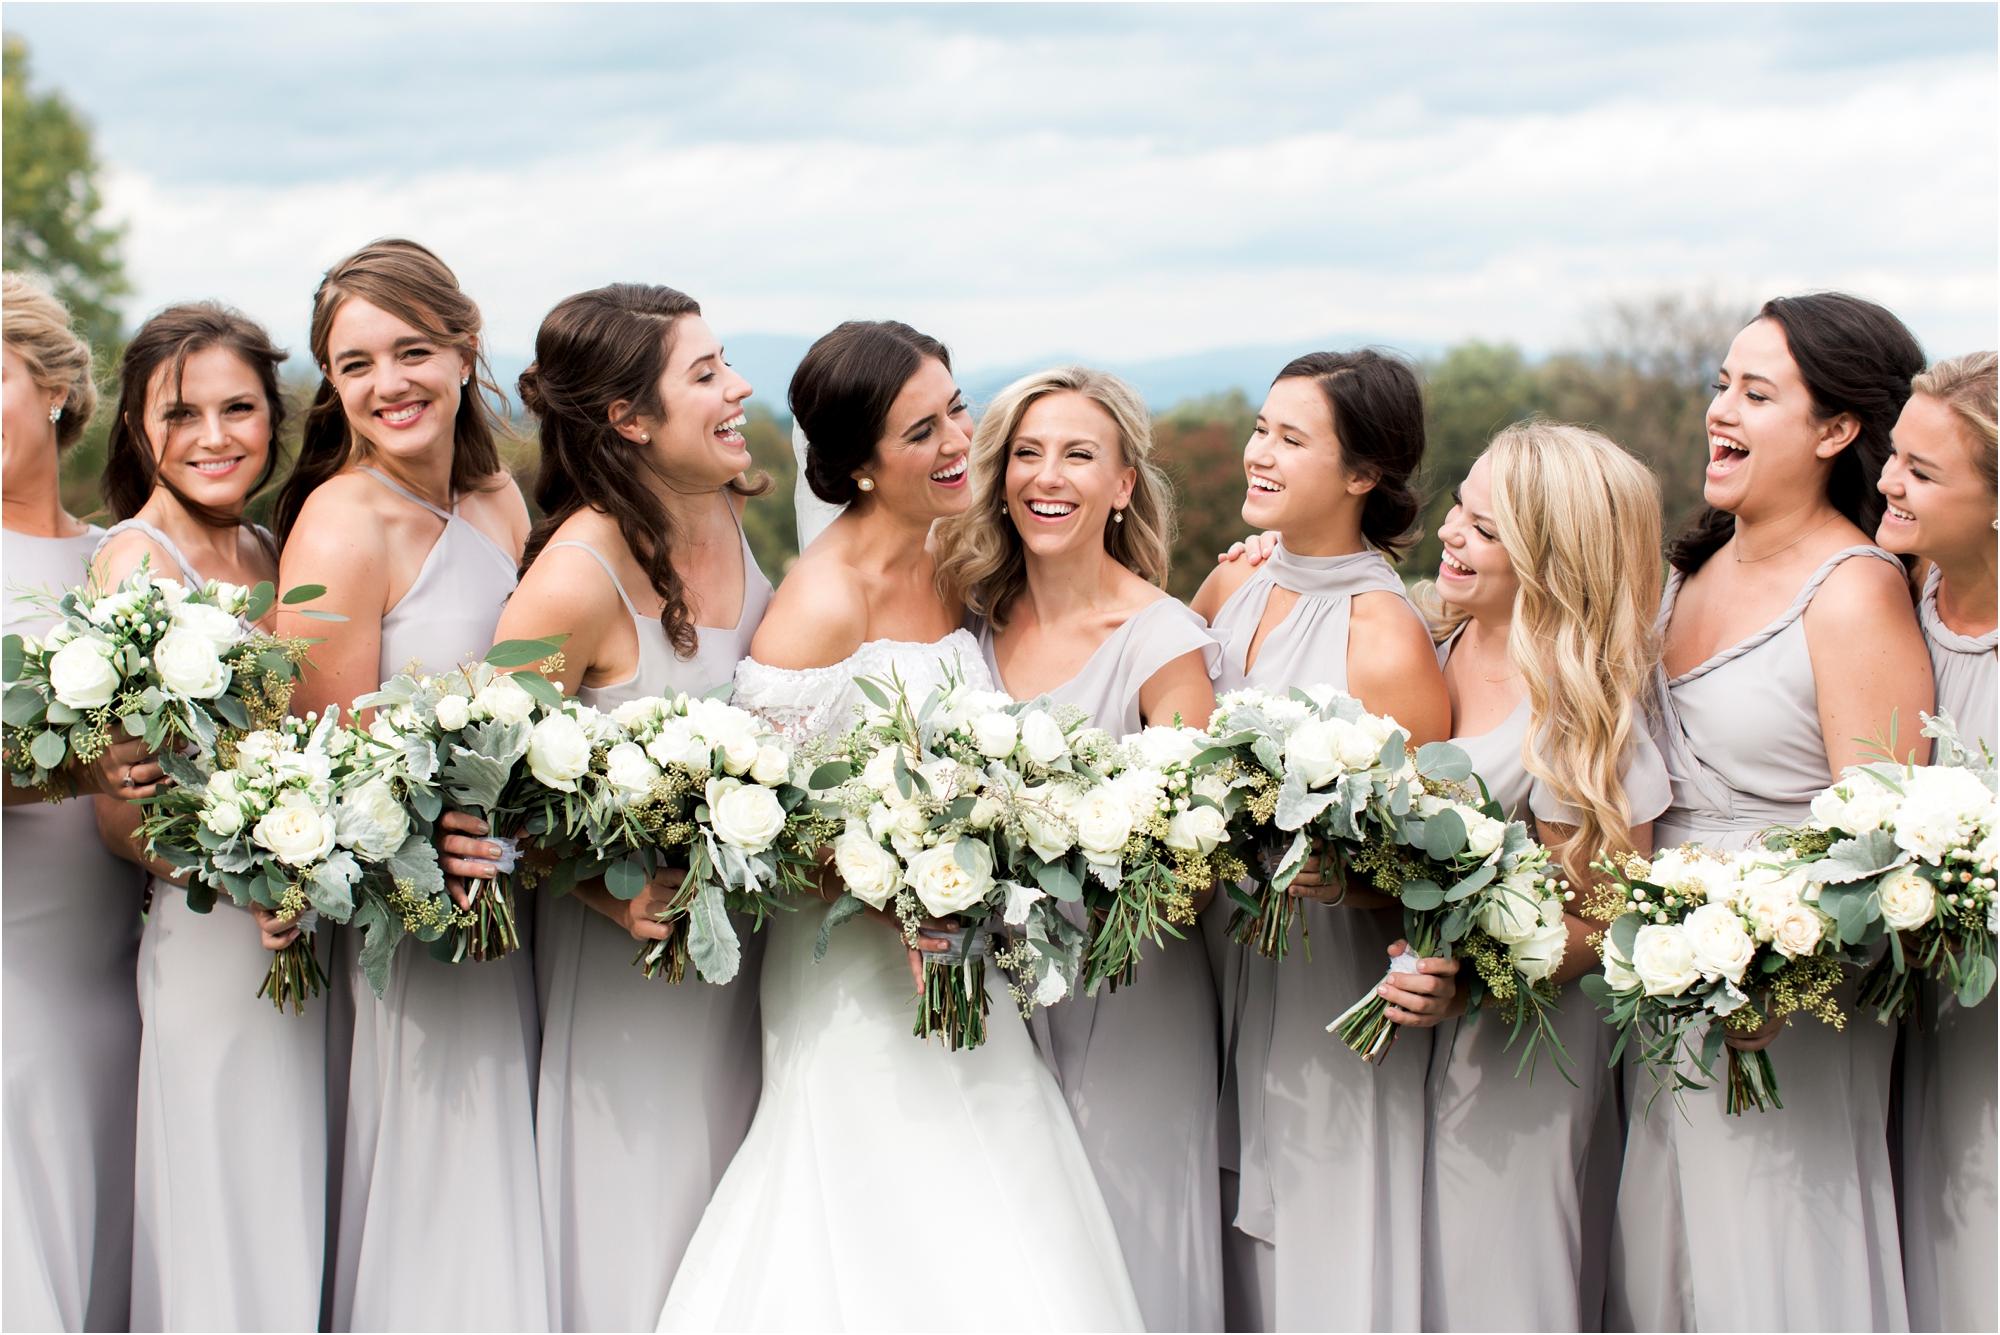 claire-thomas-farmington-country-club-charlottesville-virginia-wedding-photos_0018.jpg